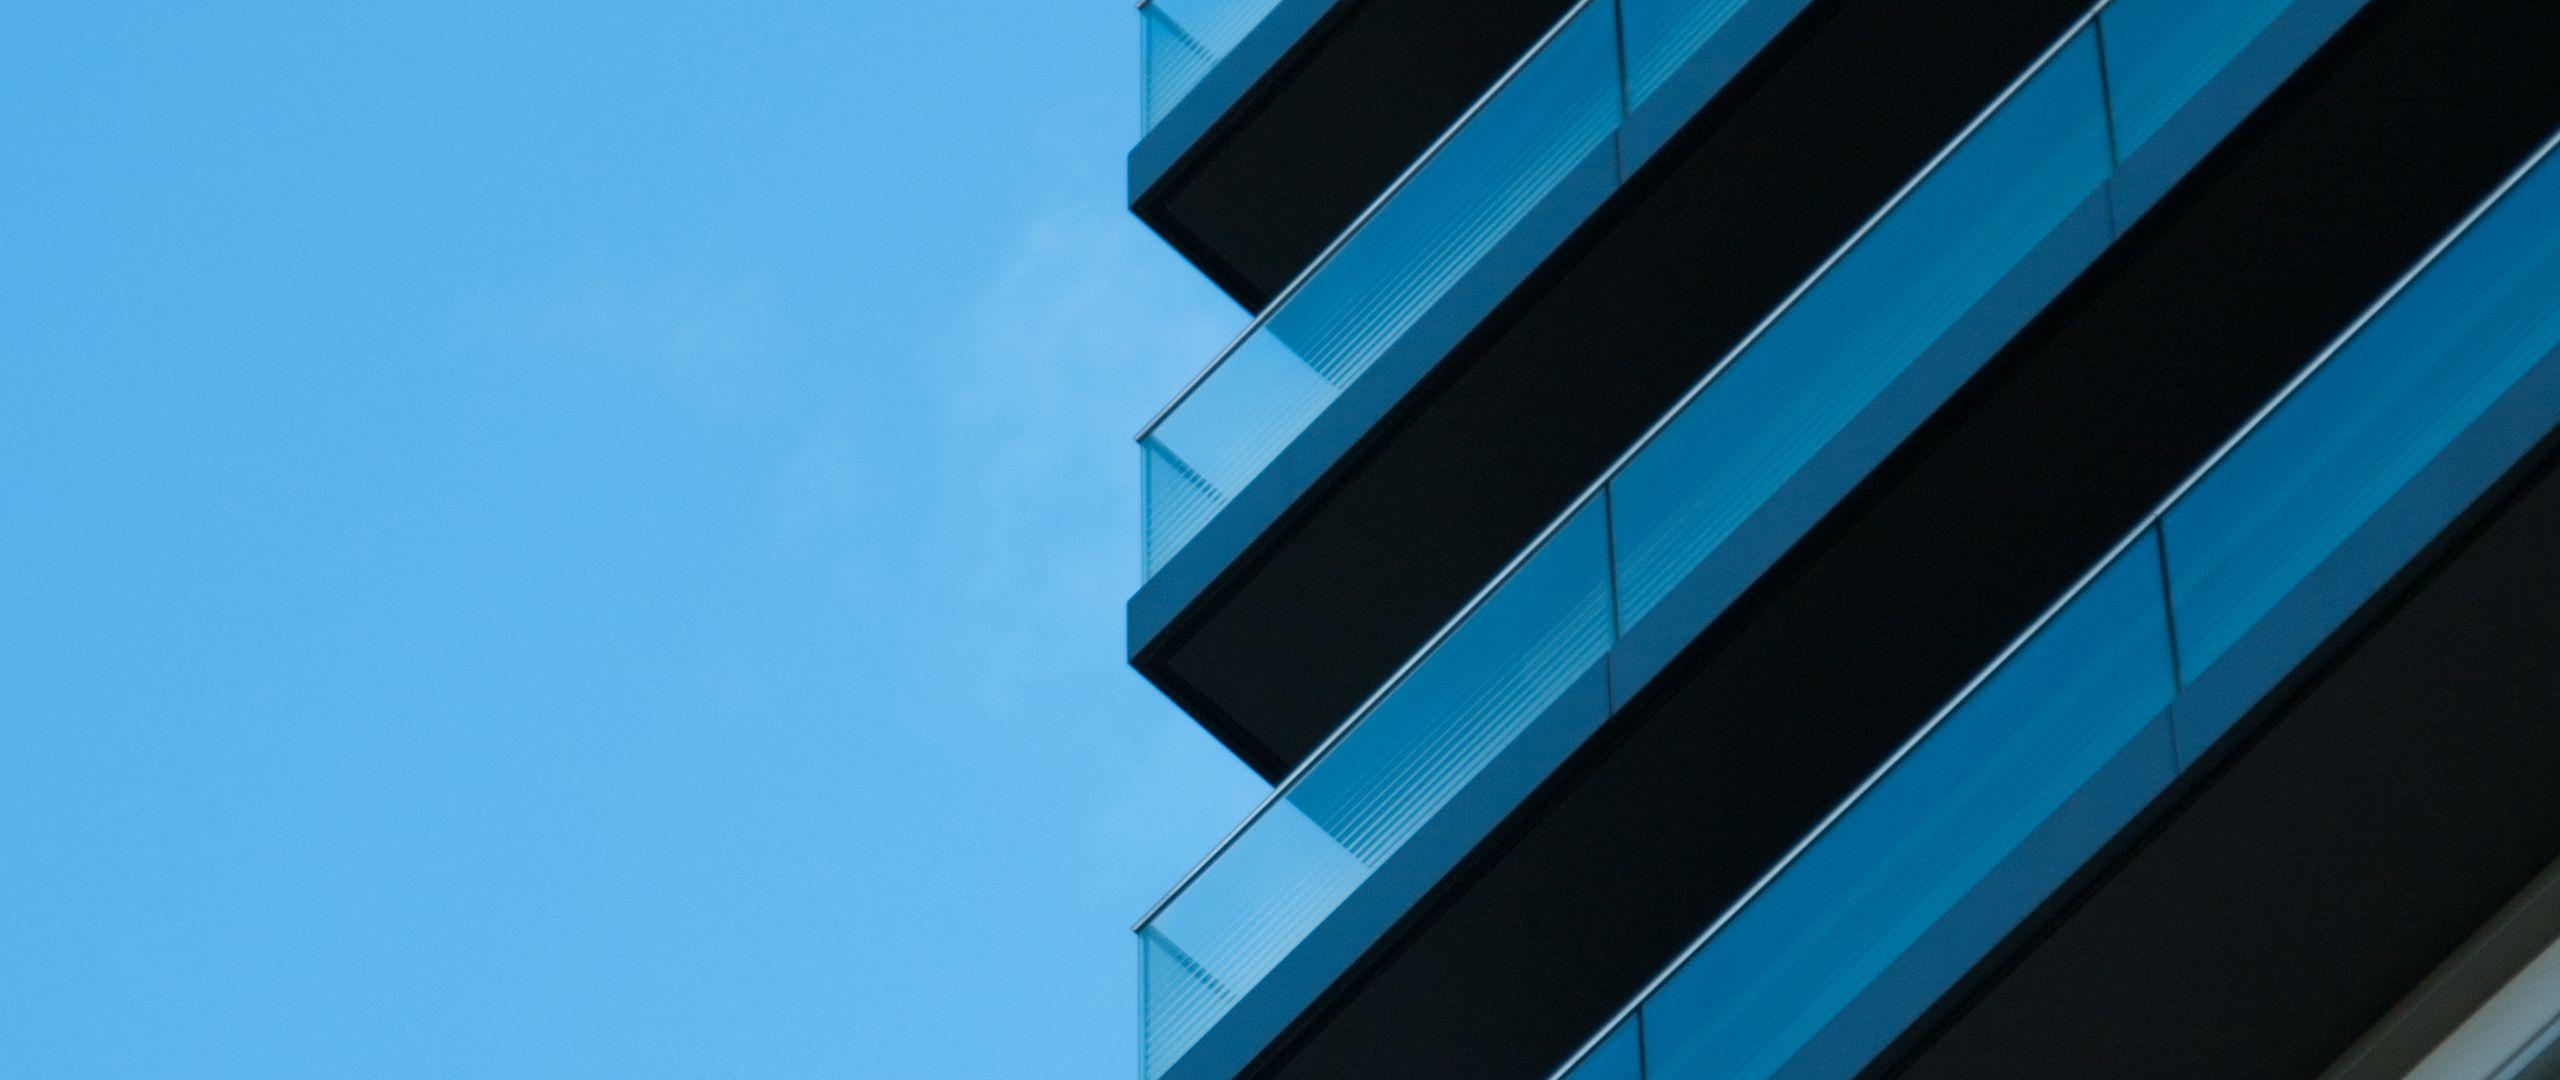 2560x1080 Wallpaper building, architecture, glass, sky, blue, minimalism